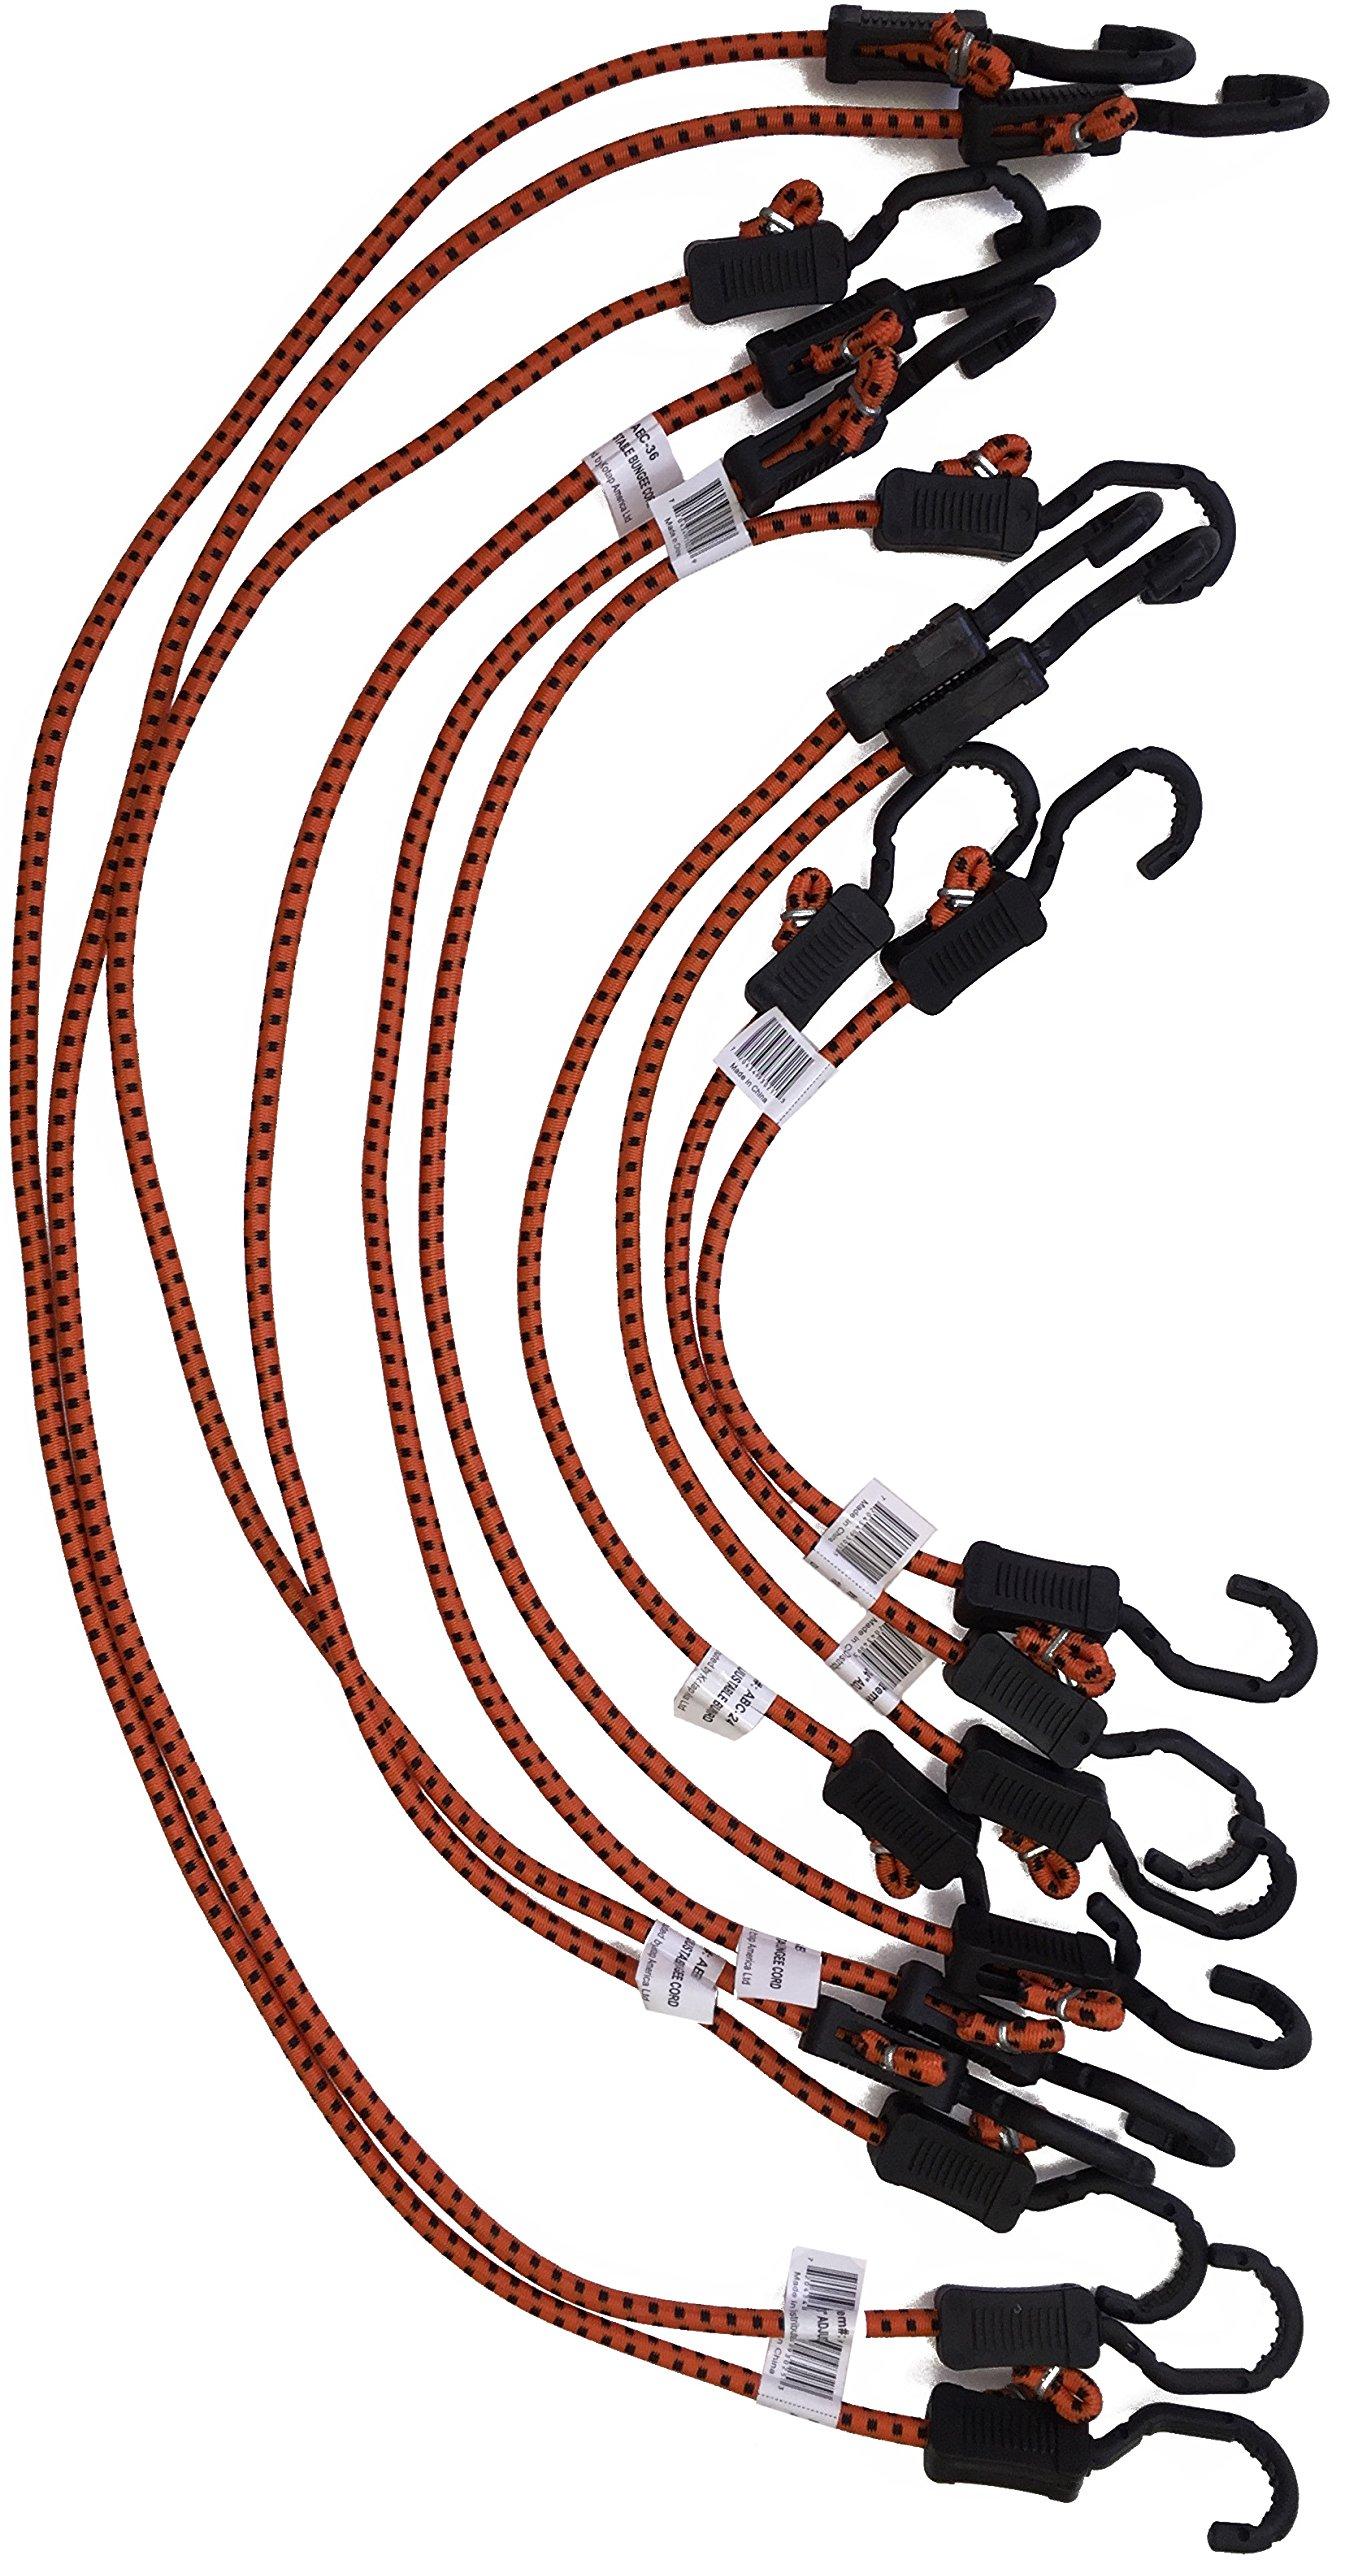 Kotap Adjustable Bungee Cords, 10-Piece Assortment Pack by Kotap (Image #1)